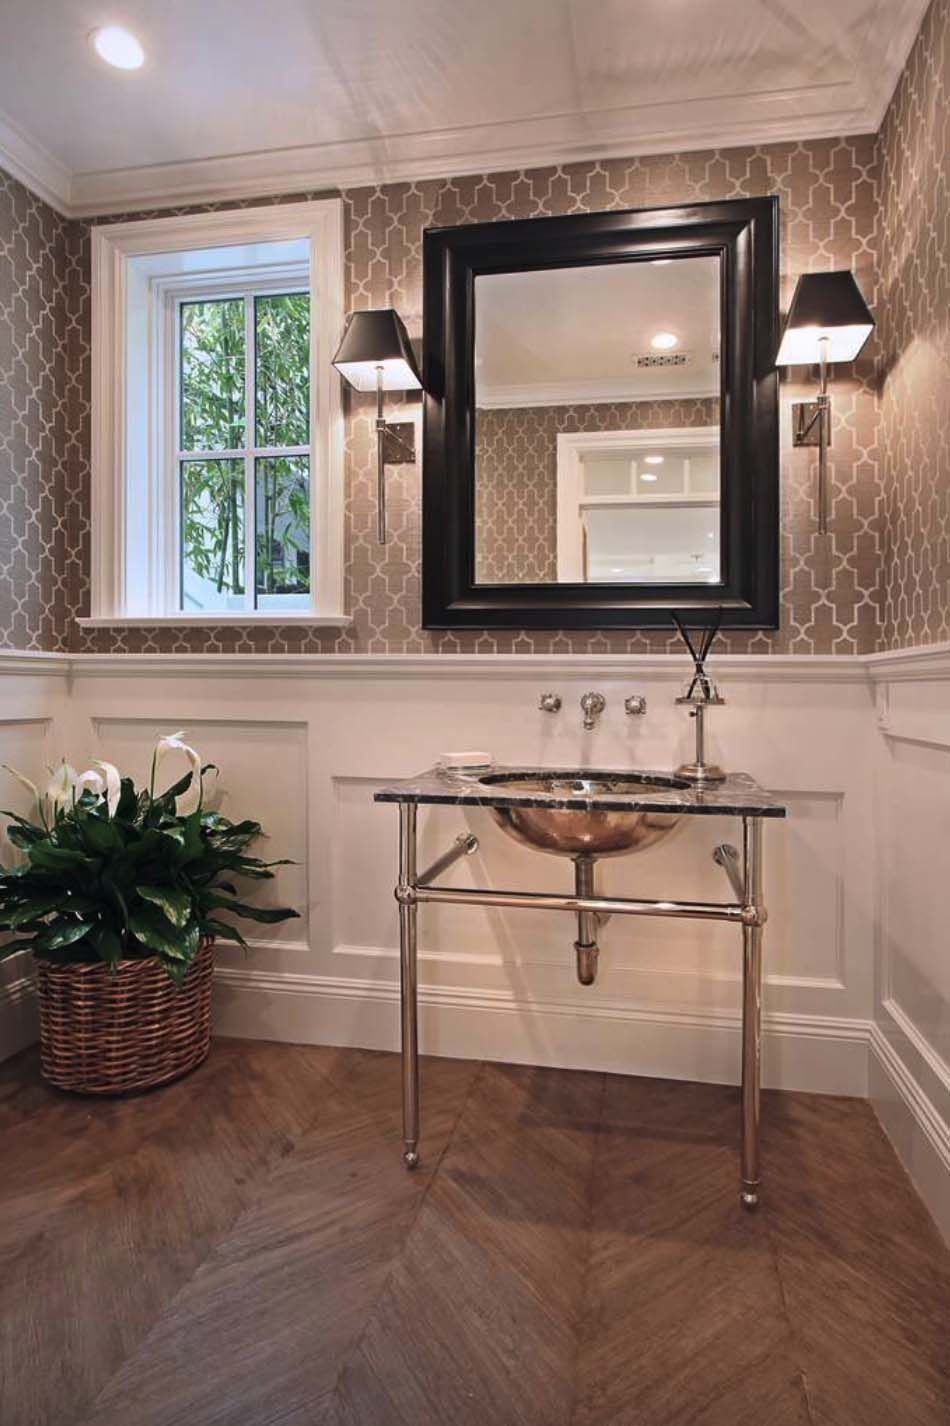 13 Awe Inspiring Coastal Bedroom Design Ideas Powder Room Wallpaper Dining Room Wainscoting